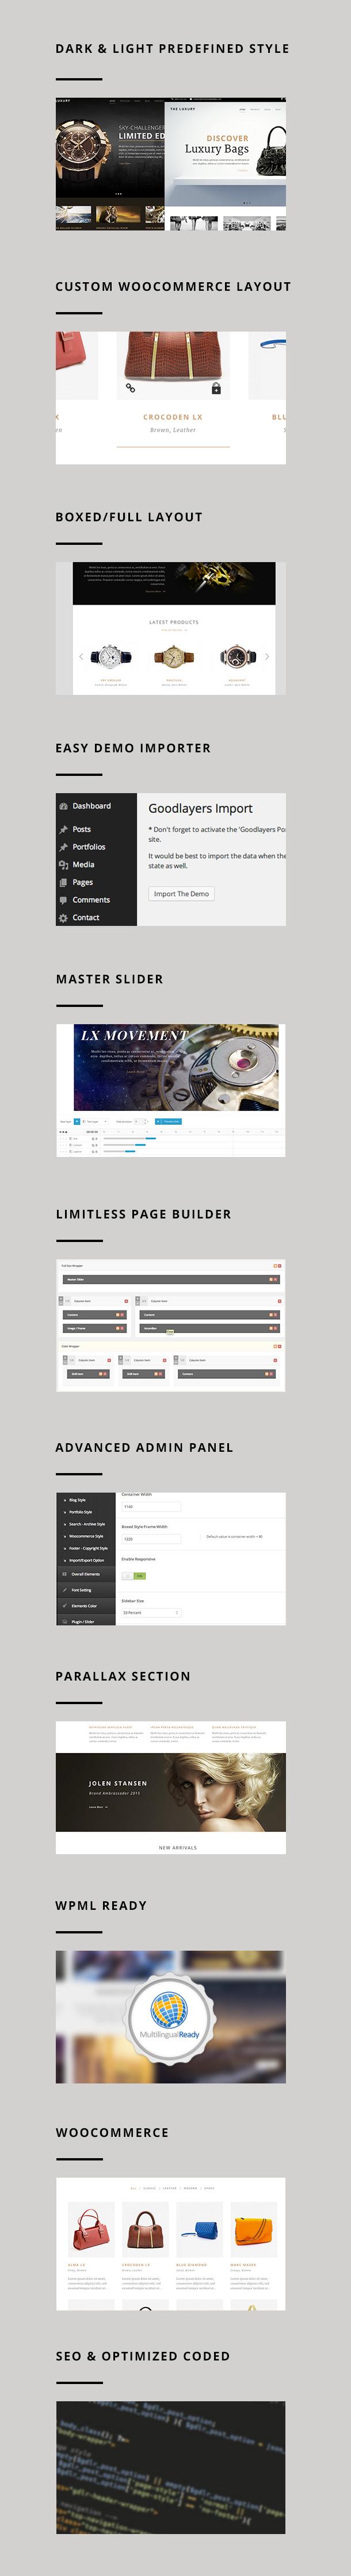 luxury2 - The Luxury - Dark/Light Responsive WordPress Theme